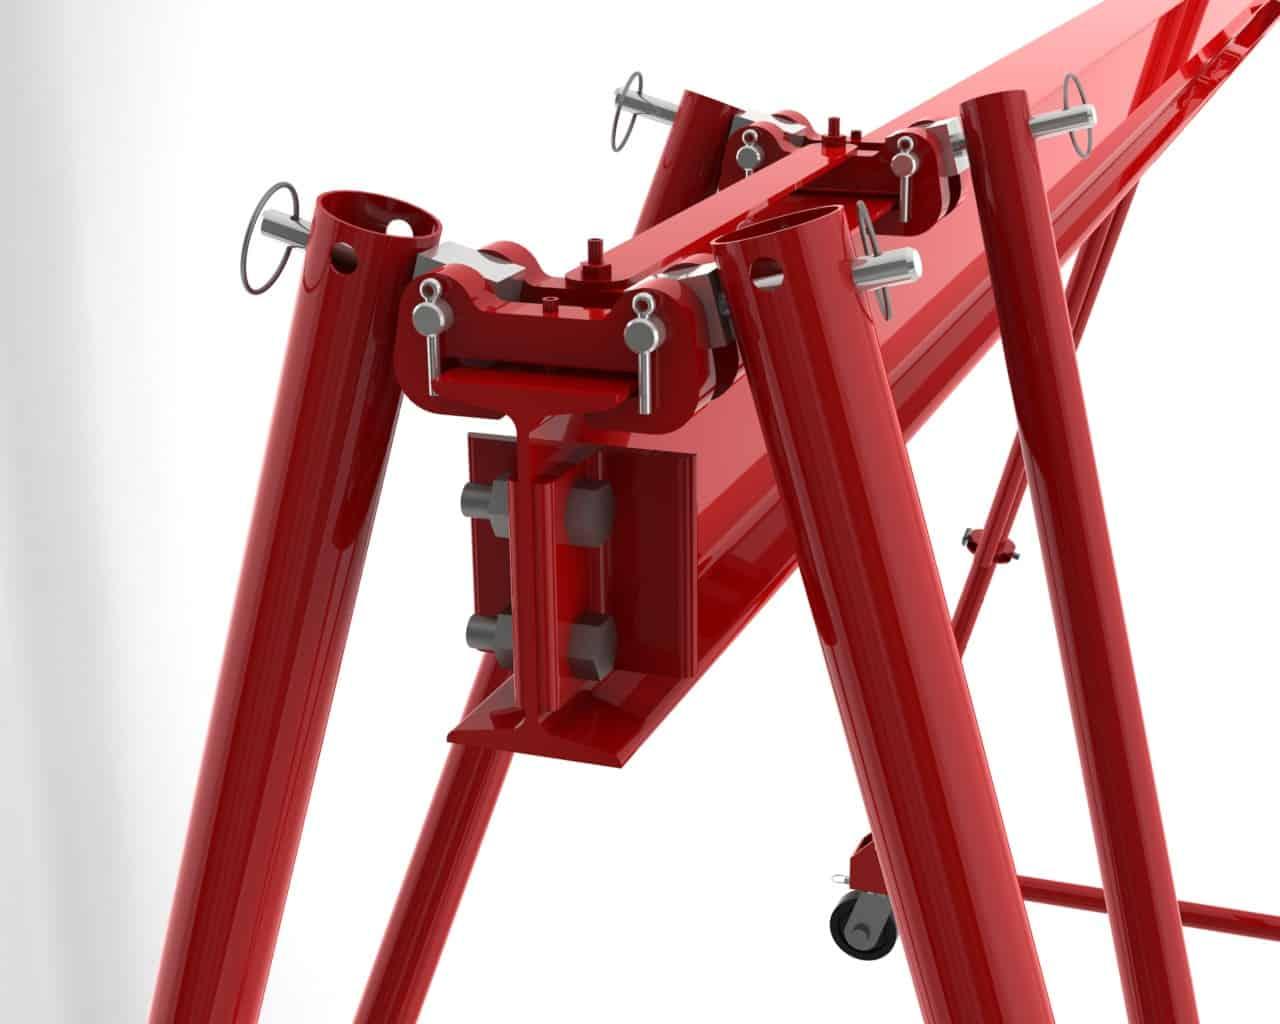 Wallace Tri-Adjustable Gantry Cranes - Design Elegance